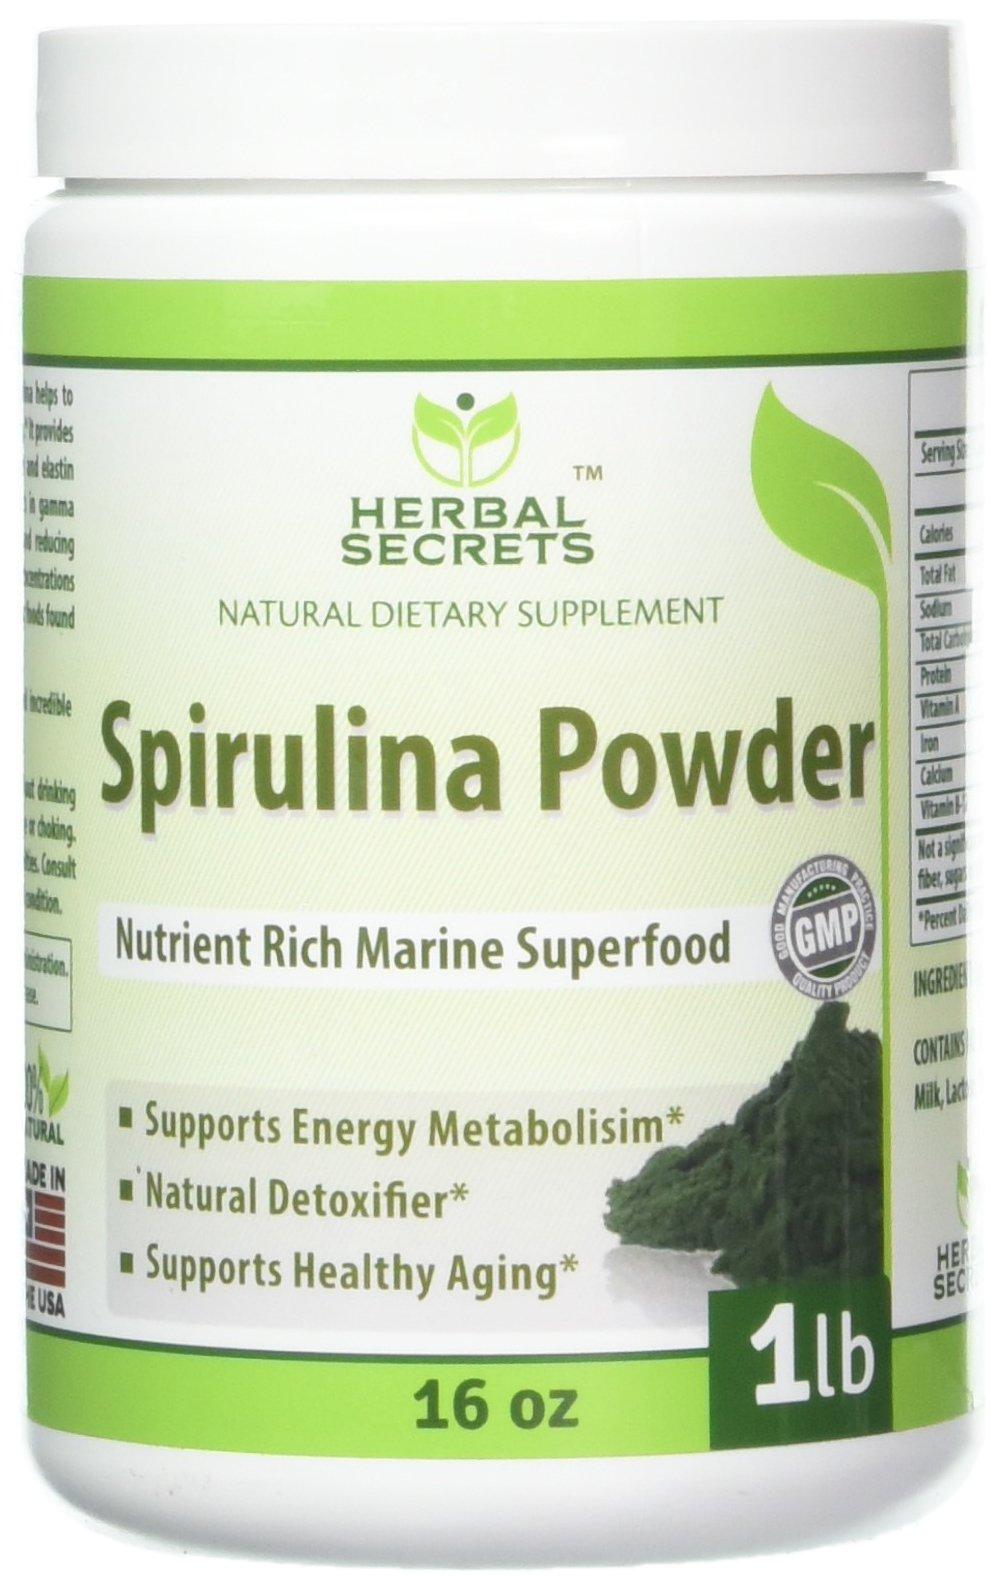 Herbal Secrets Non-GMO Spirulina Powder 1 lb (16 oz) - Highest Quality Spirulina on Earth - 100% Vegetarian, Gluten Free & Non-Irradiated - Blue Green Algae Perfect for Smoothies, Juices & More